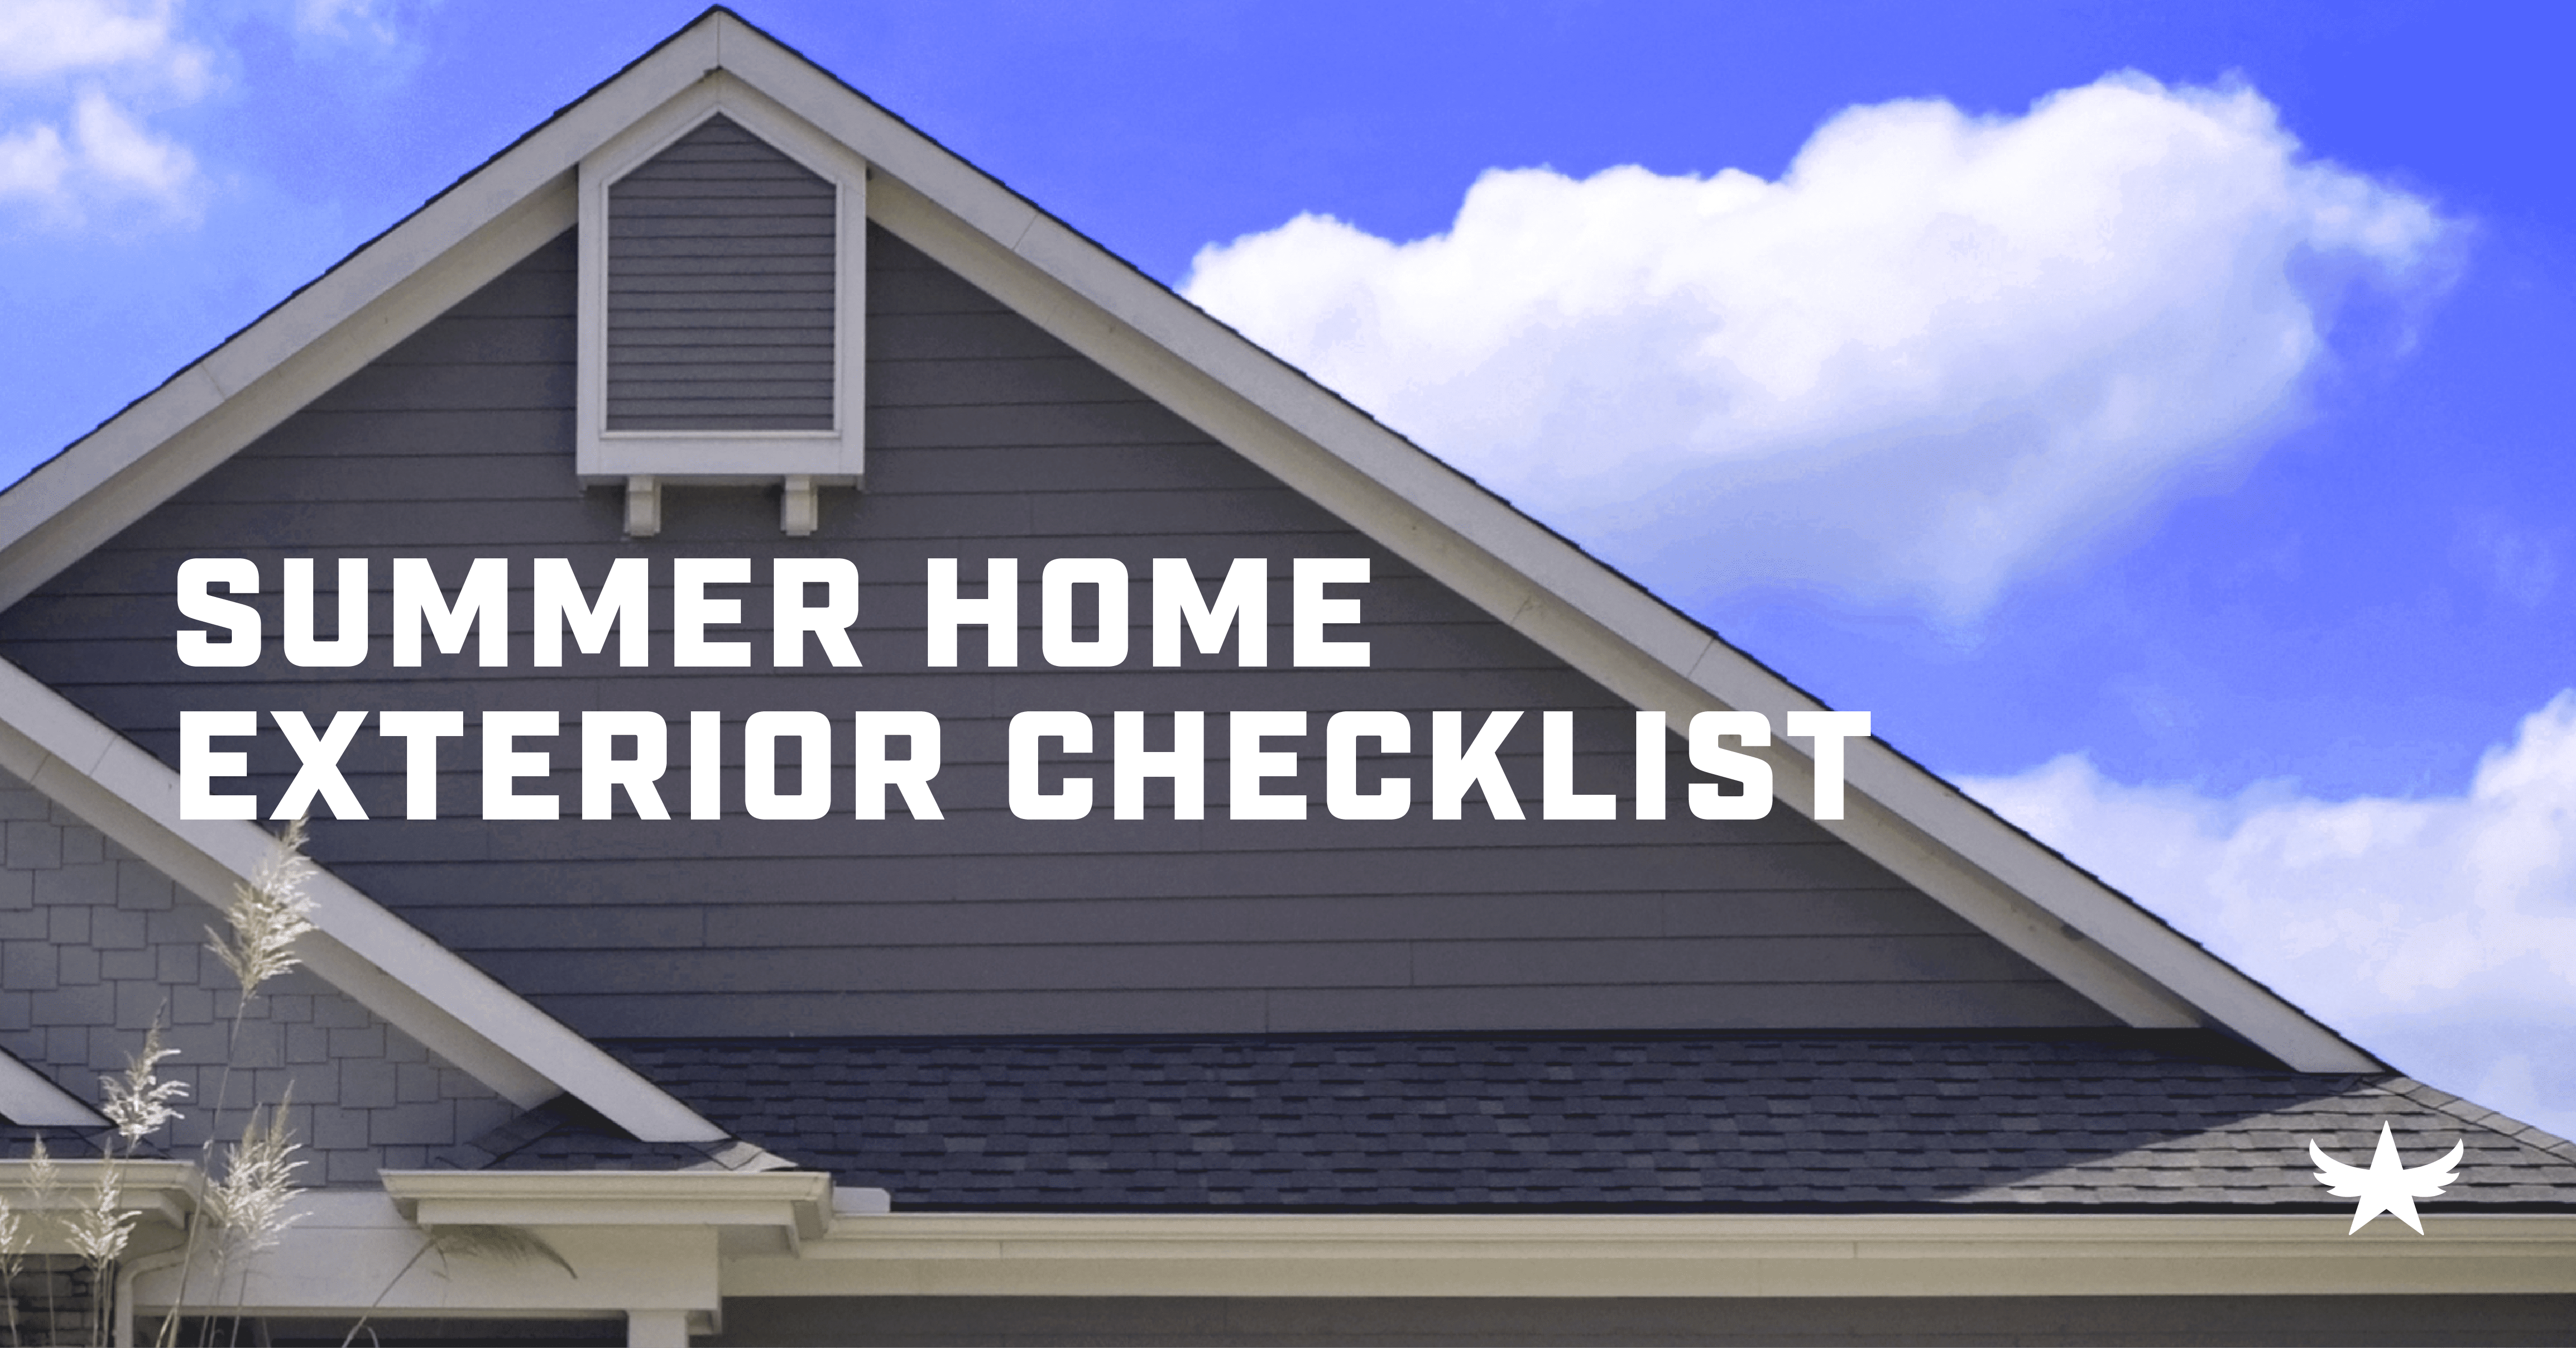 Summer Home Exterior Checklist